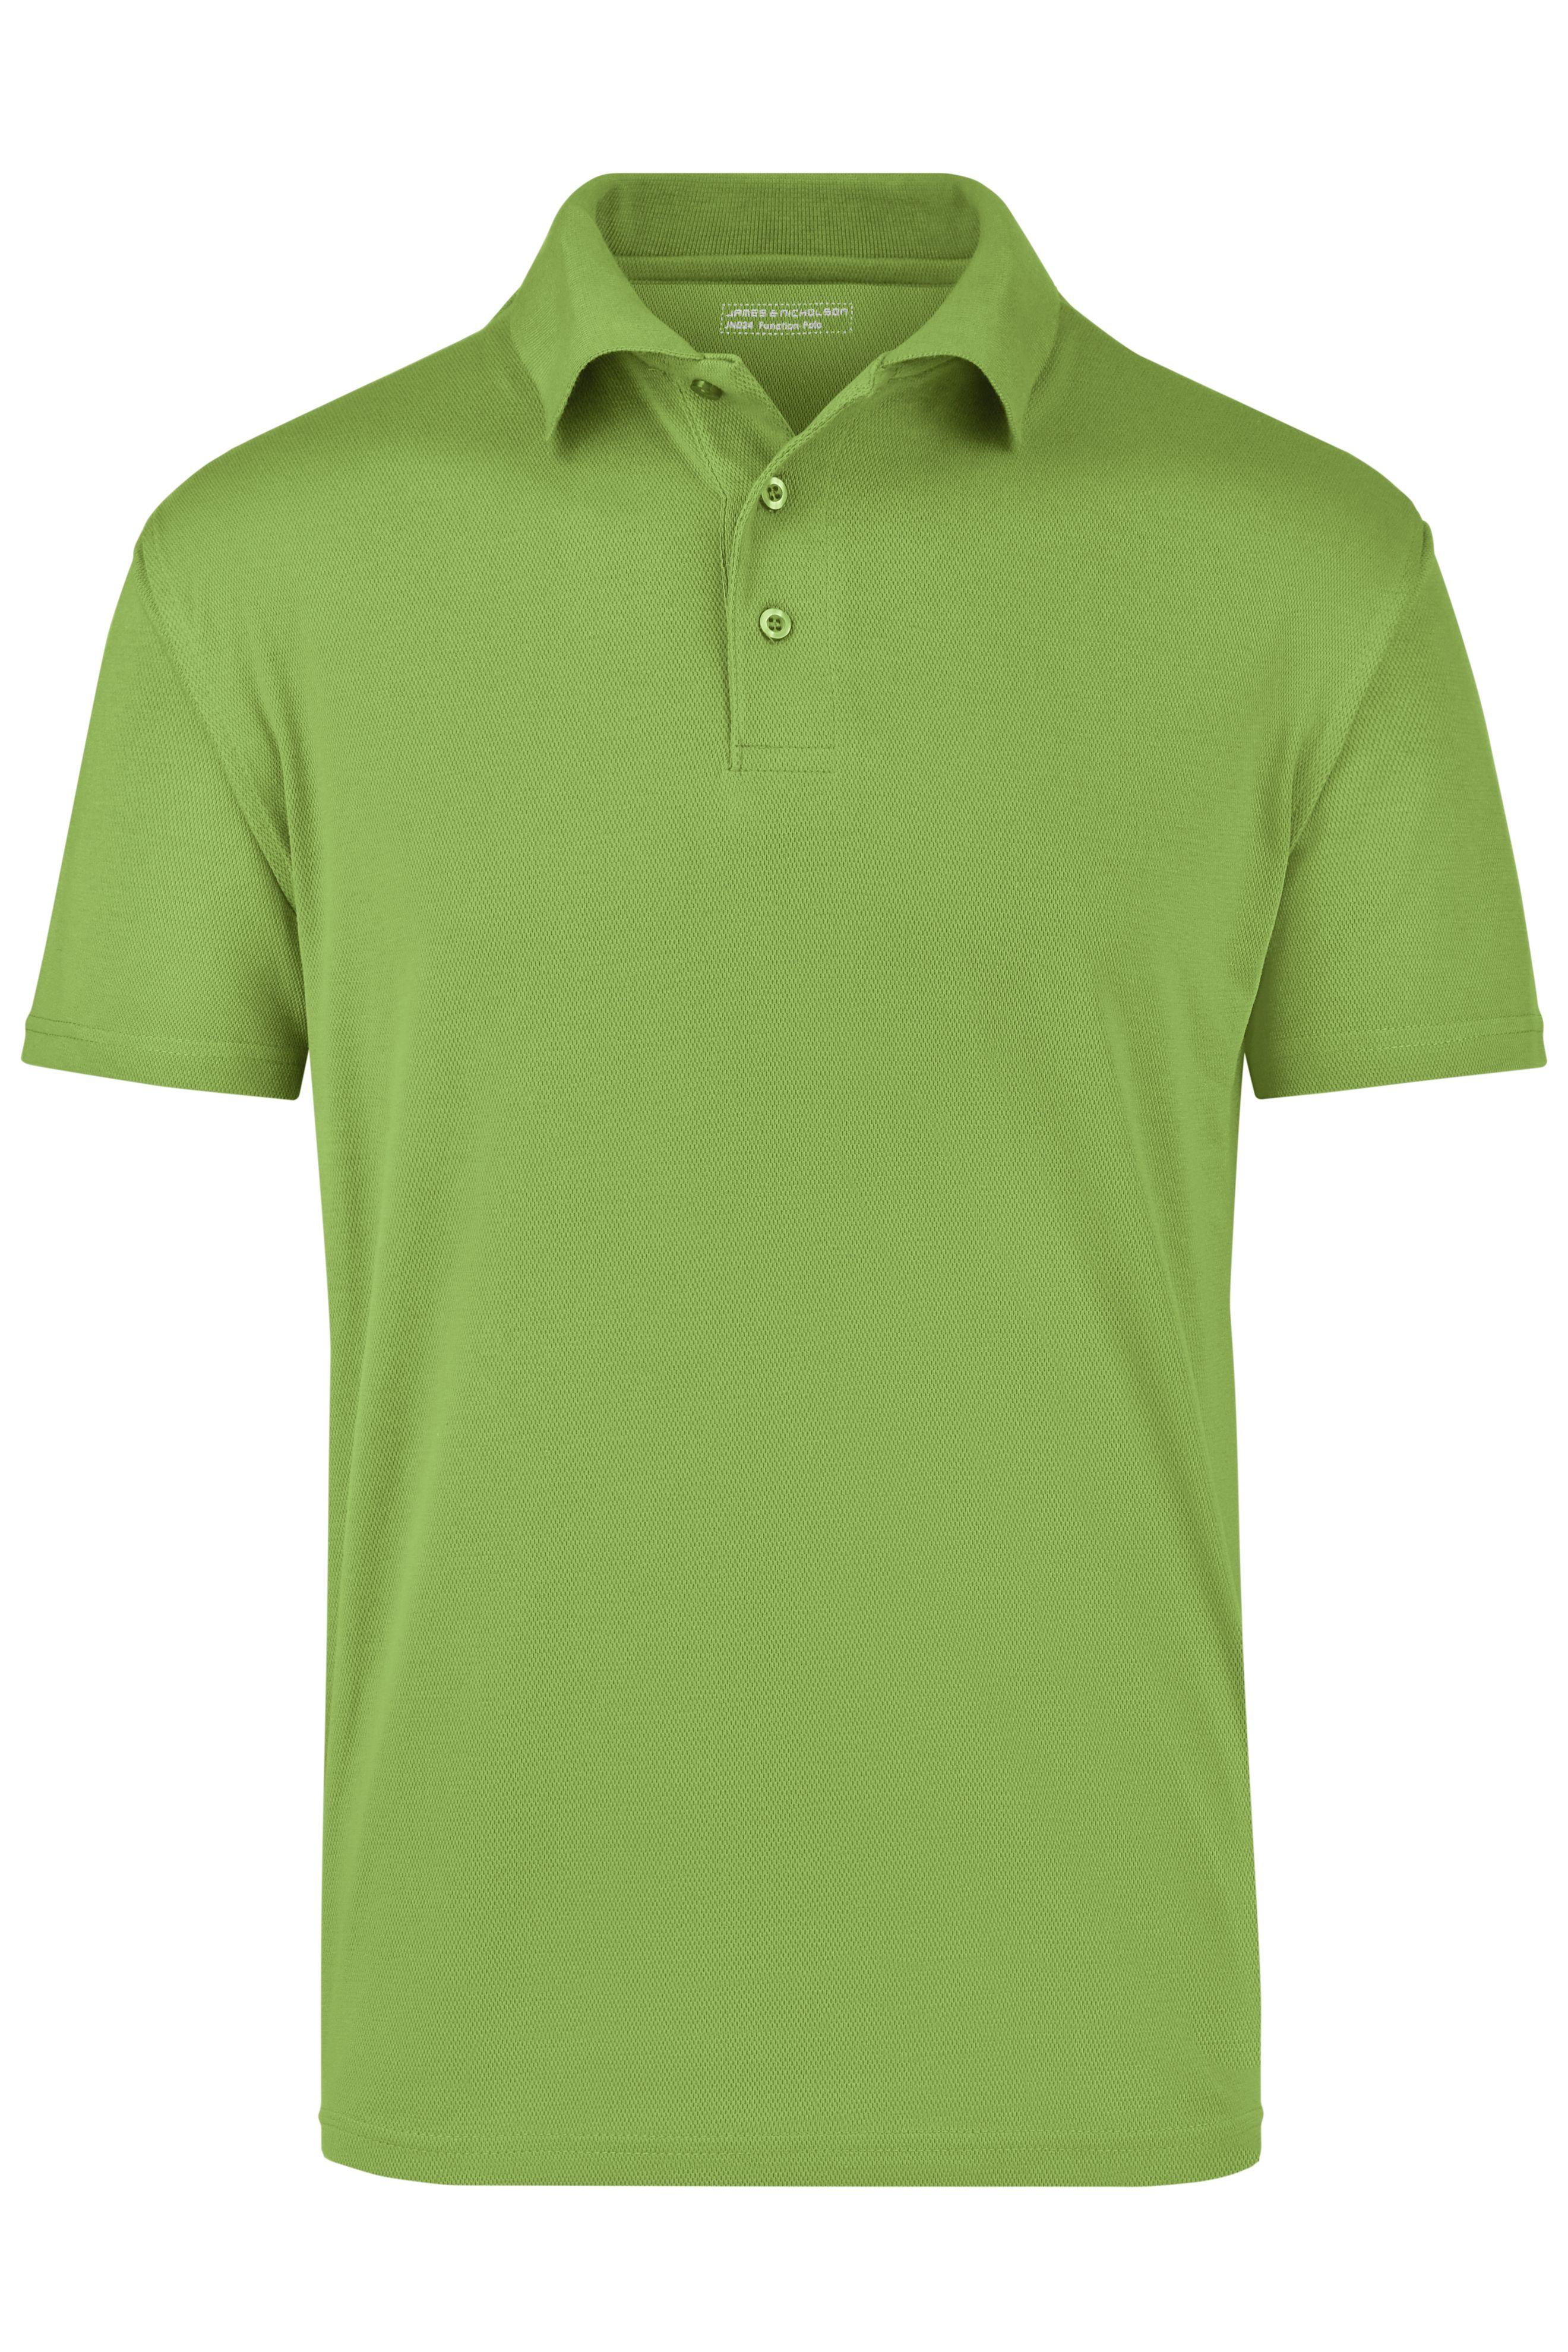 Polohemd aus hochfunktionellem CoolDry®